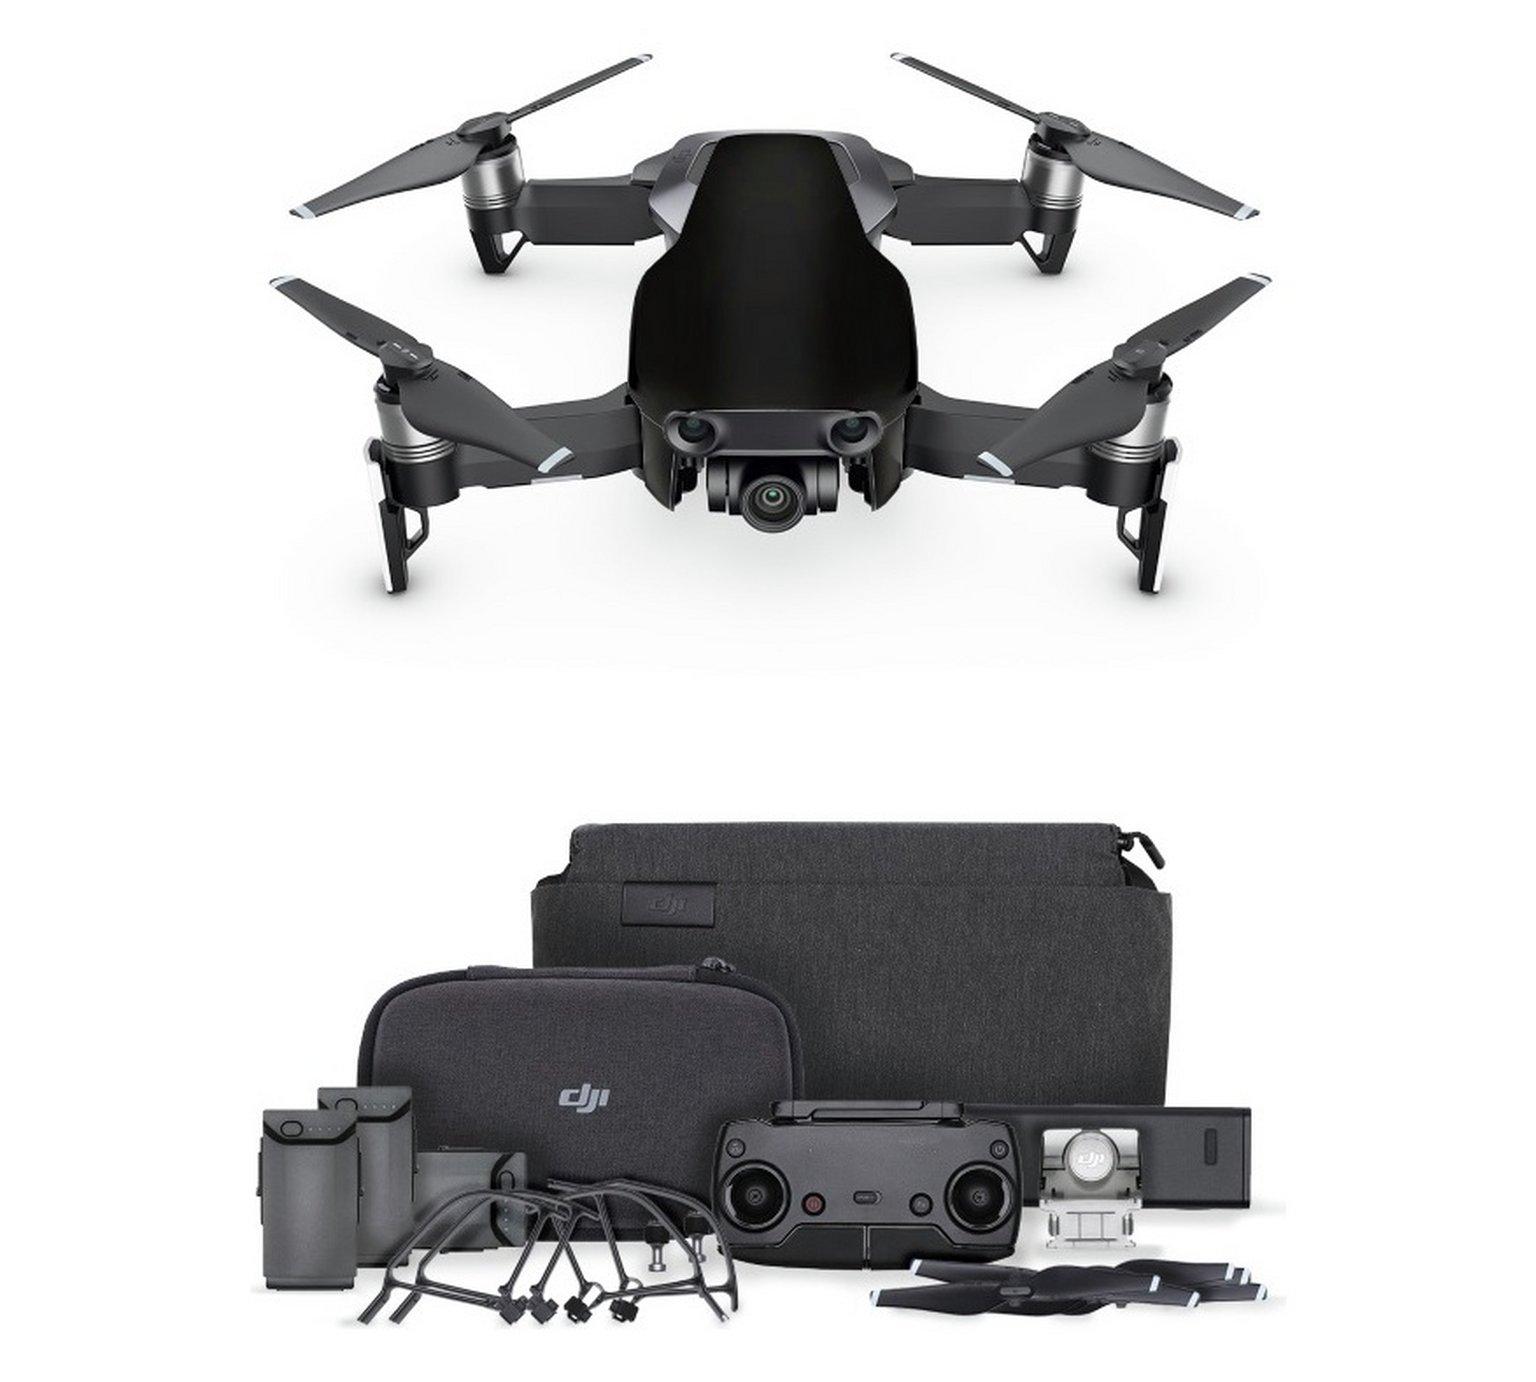 DJI Mavic Air Fly More Drone Combo - Onyx Black